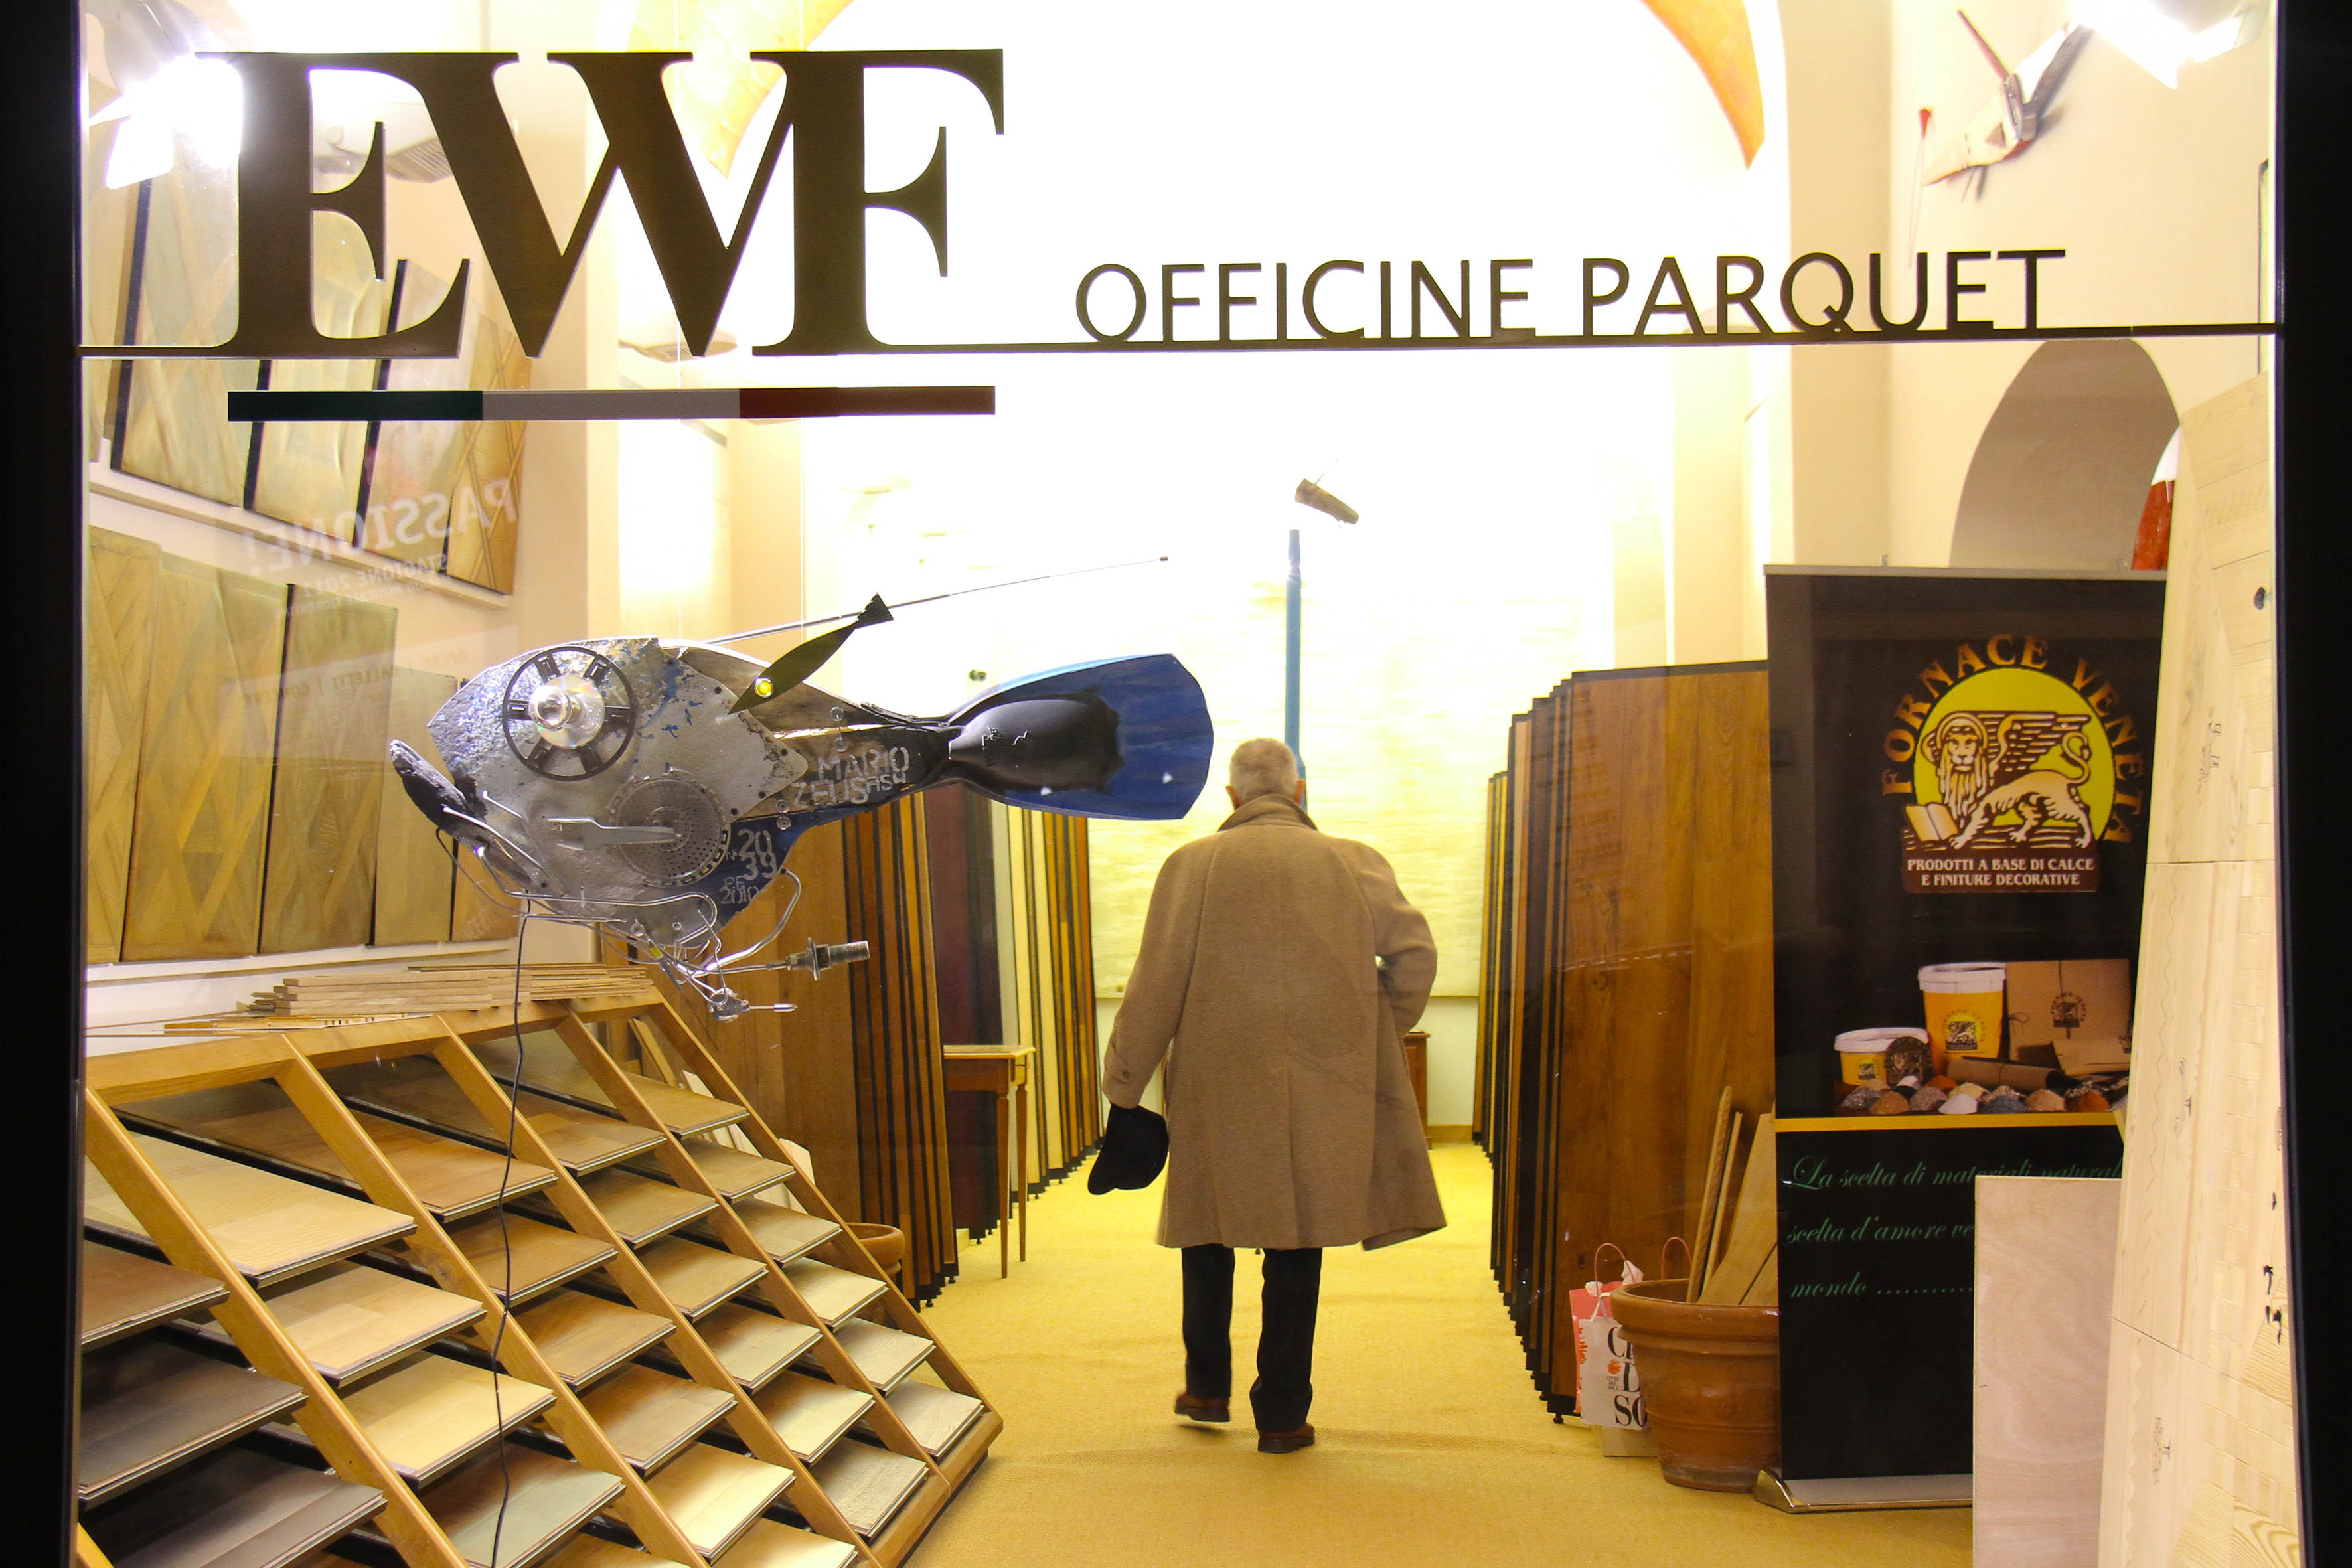 PRESSPHOTO Firenze, EWF Officine Parquet. Nella foto l'atelier